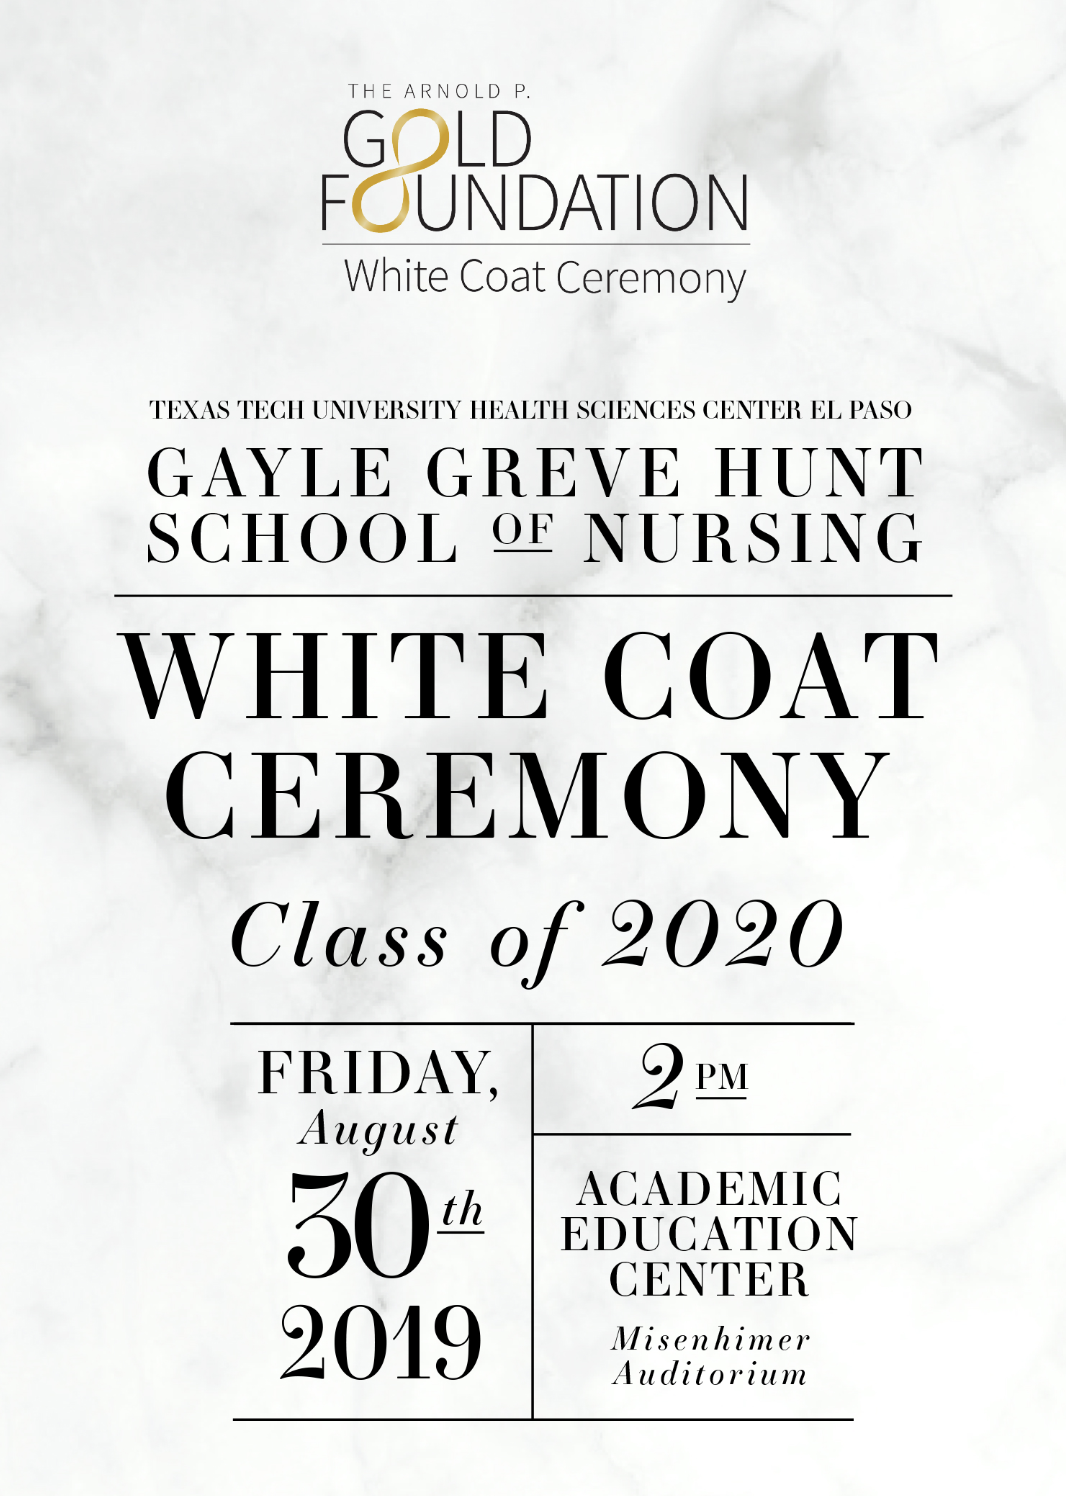 Gayle Greve Hunt School Of Nursing White Coat Ceremony Aug 30